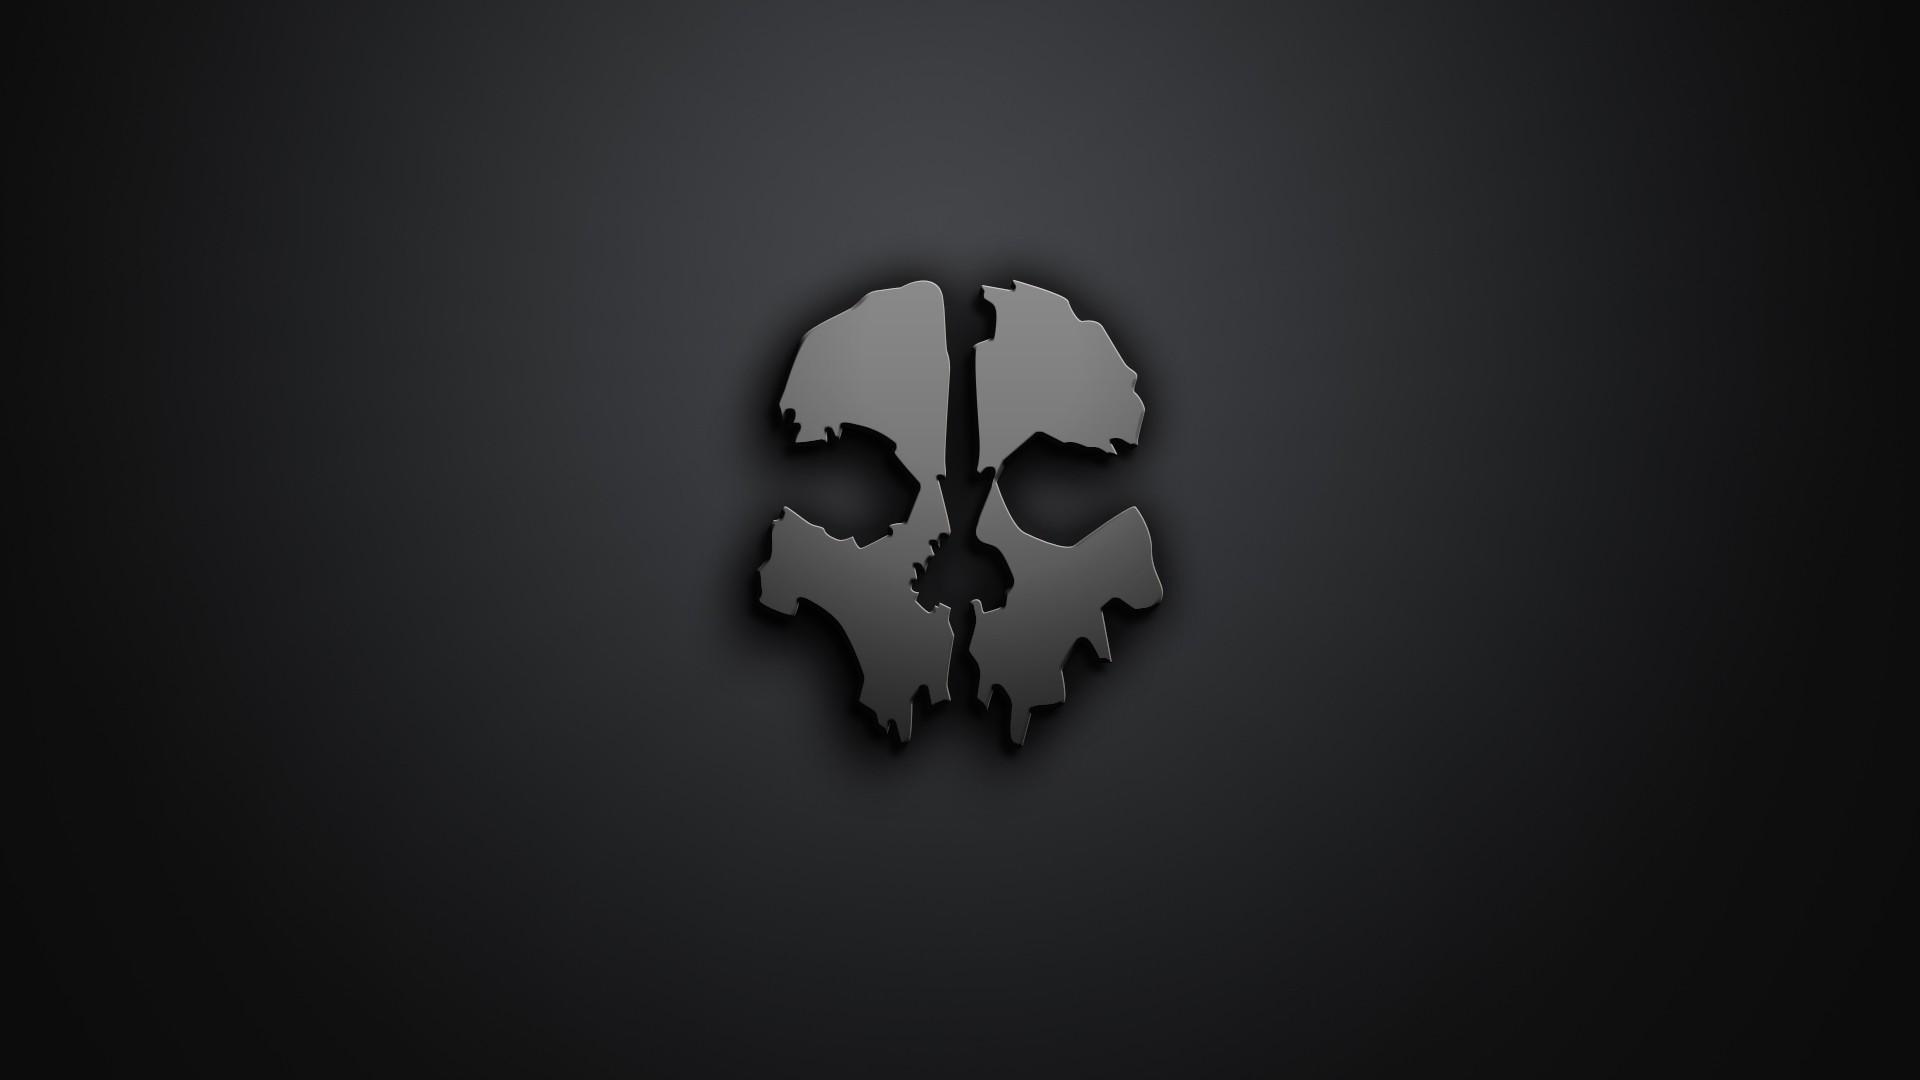 2048x1152 dishonored skull 2048x1152 resolution hd 4k - Skull 4k images ...